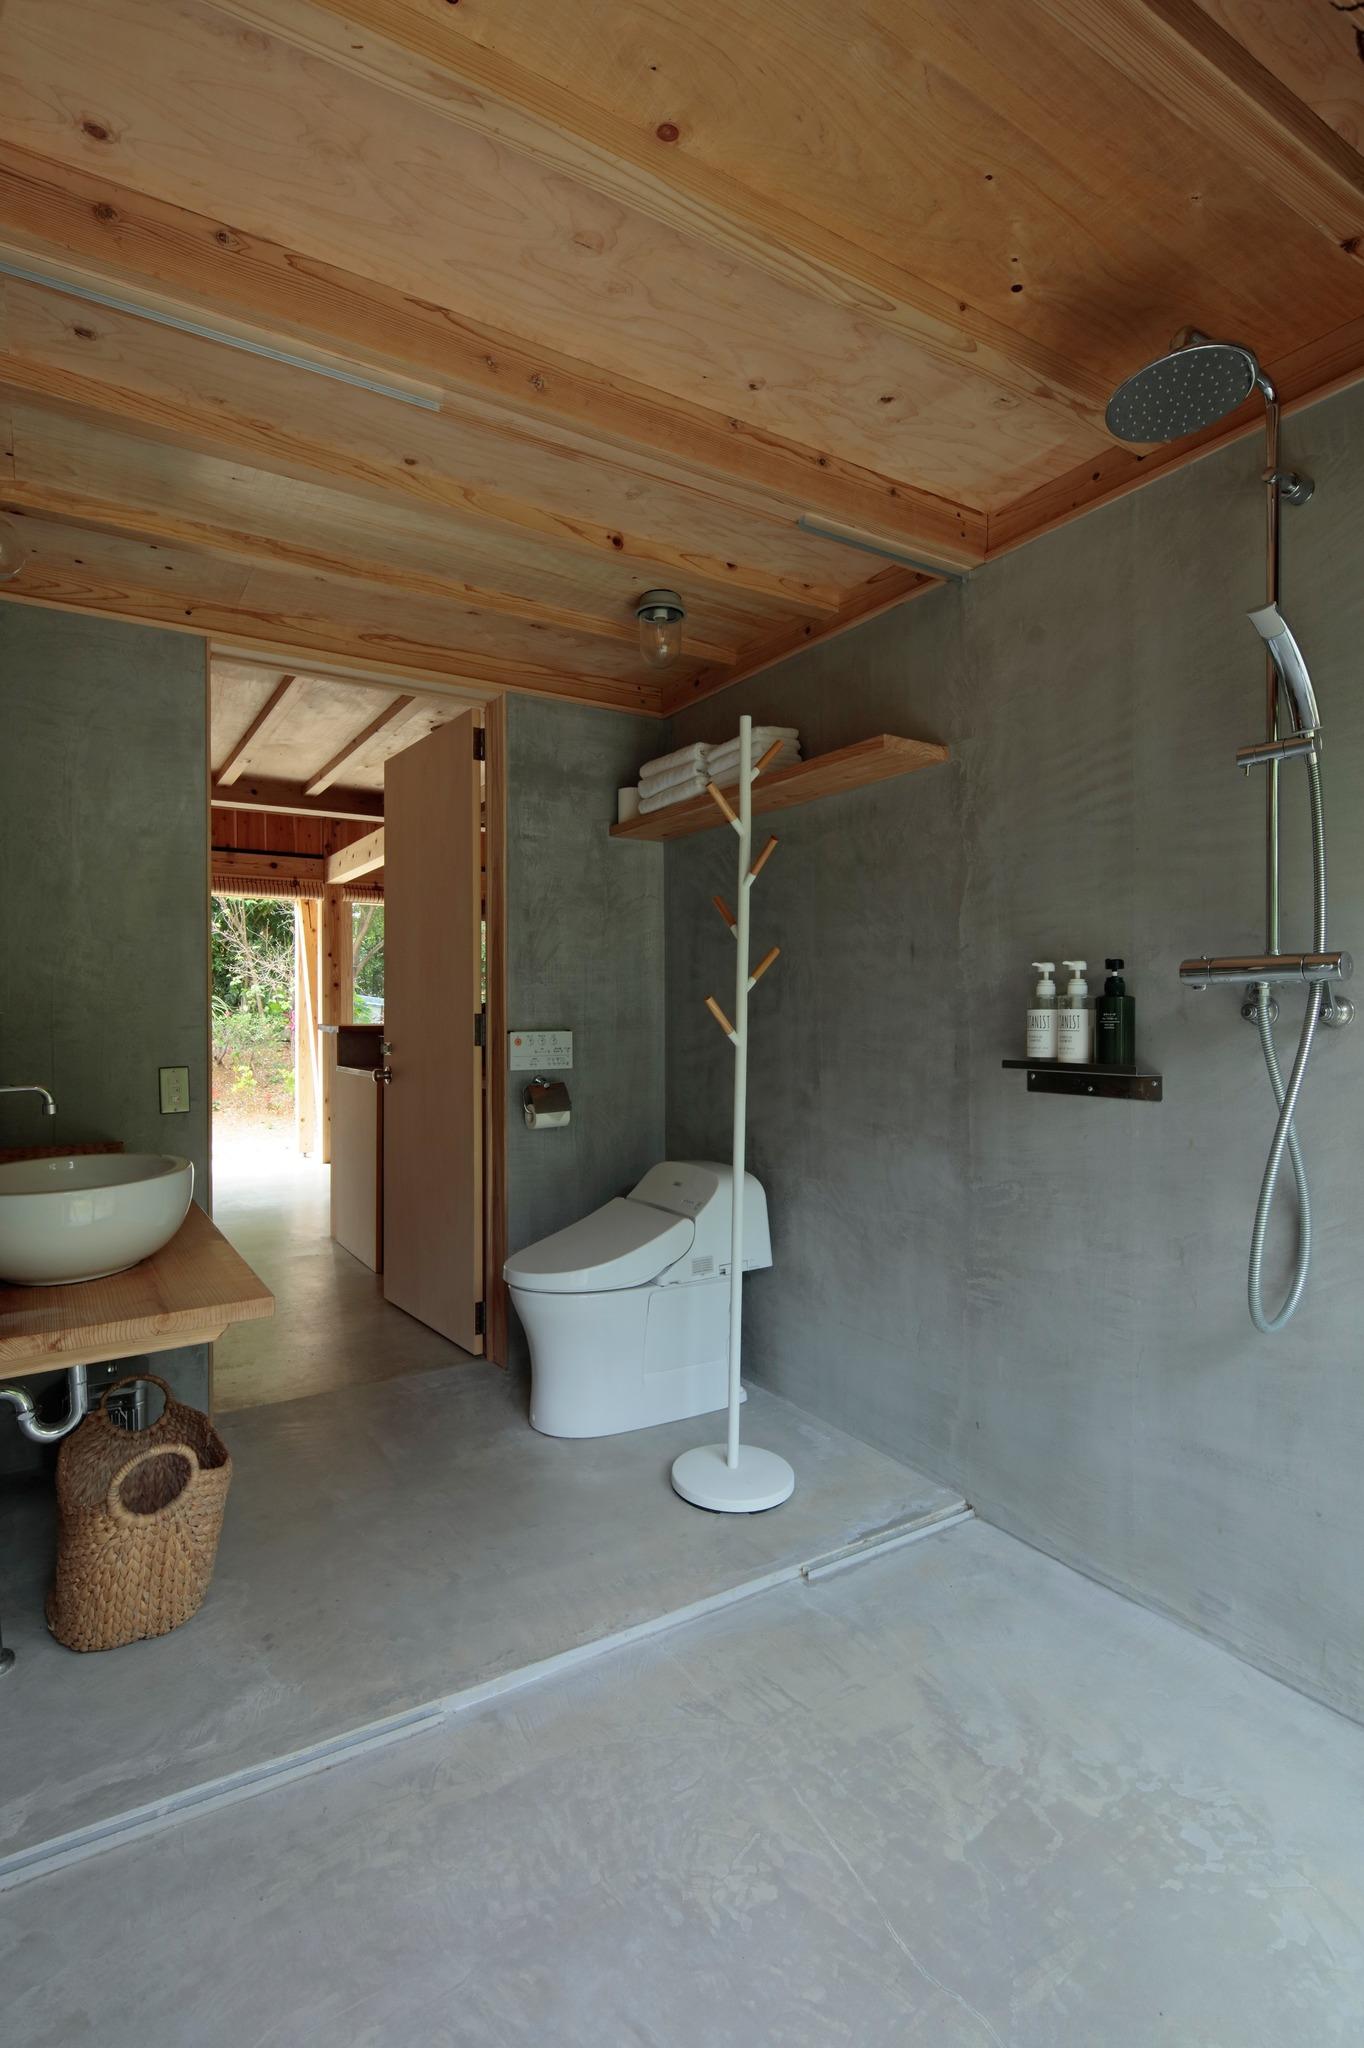 Lavatory,shower room